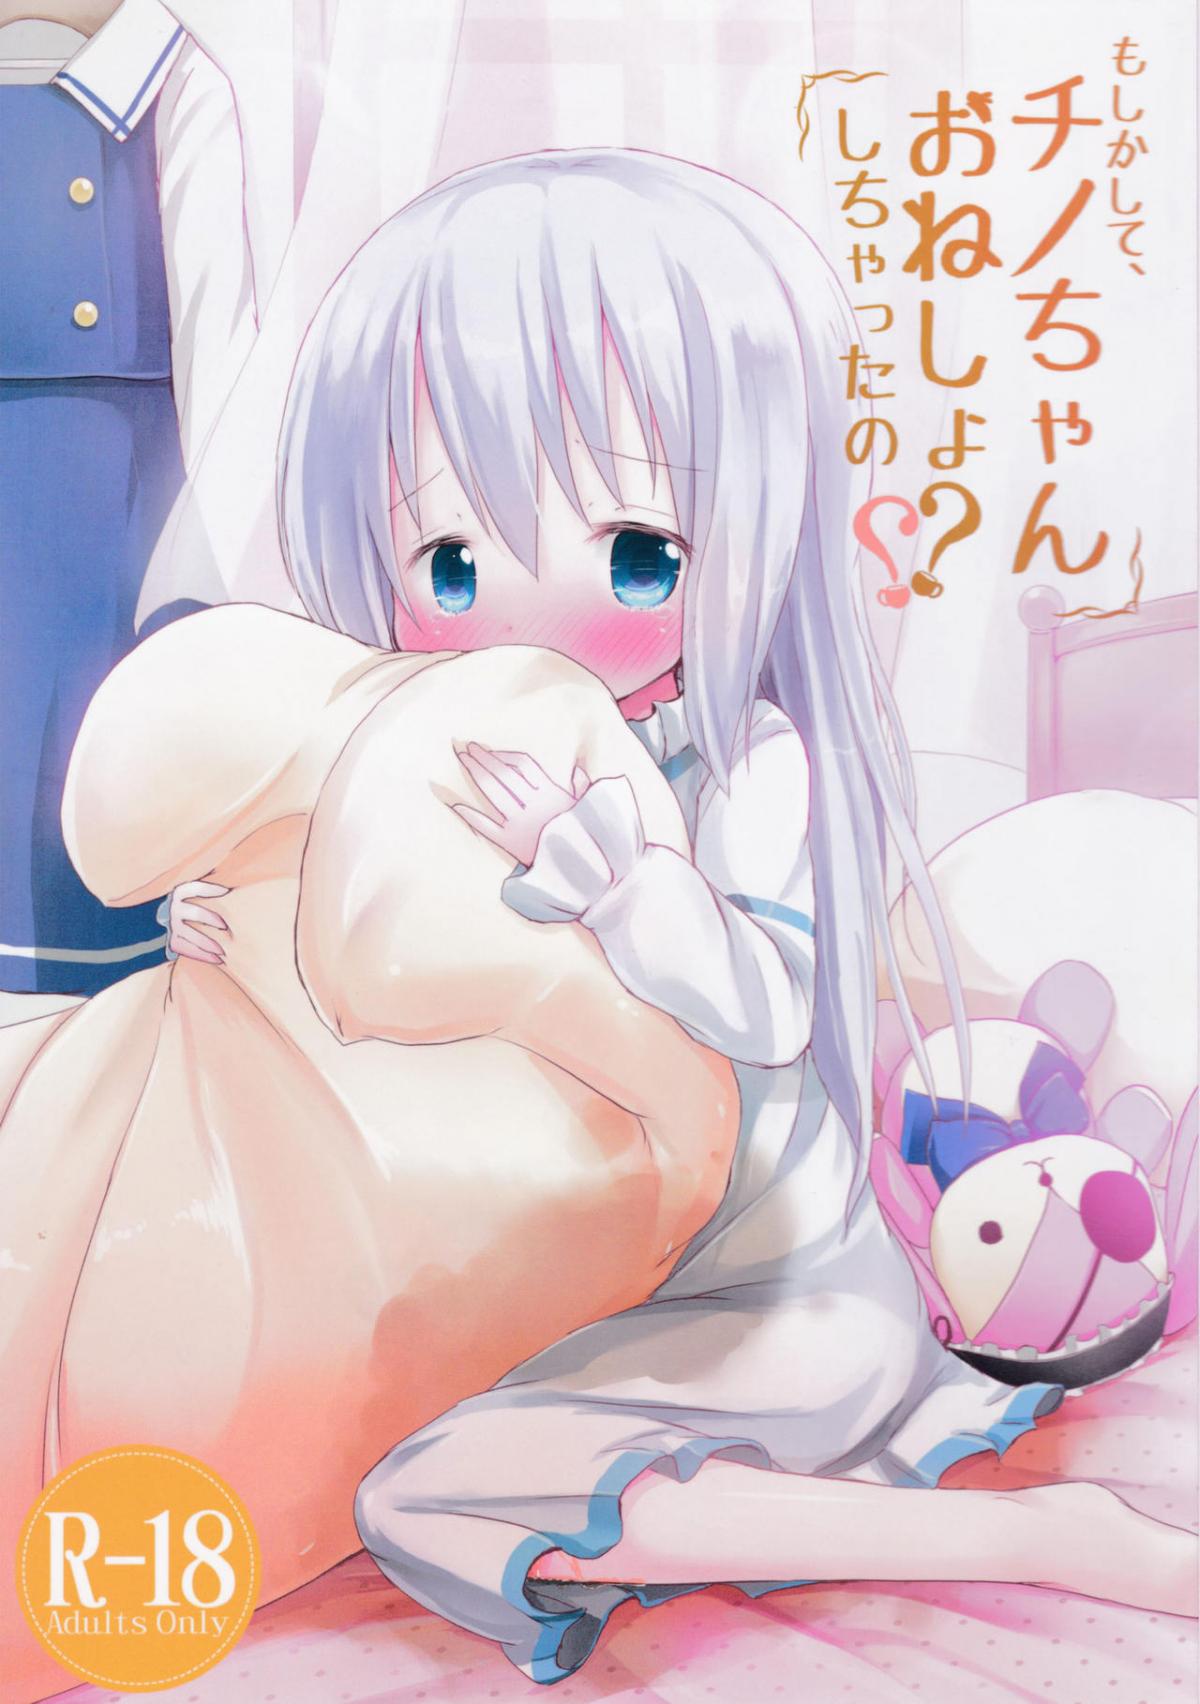 Hình ảnh  trong bài viết Moshikashite, Chino-chan Onesho Shichatta no